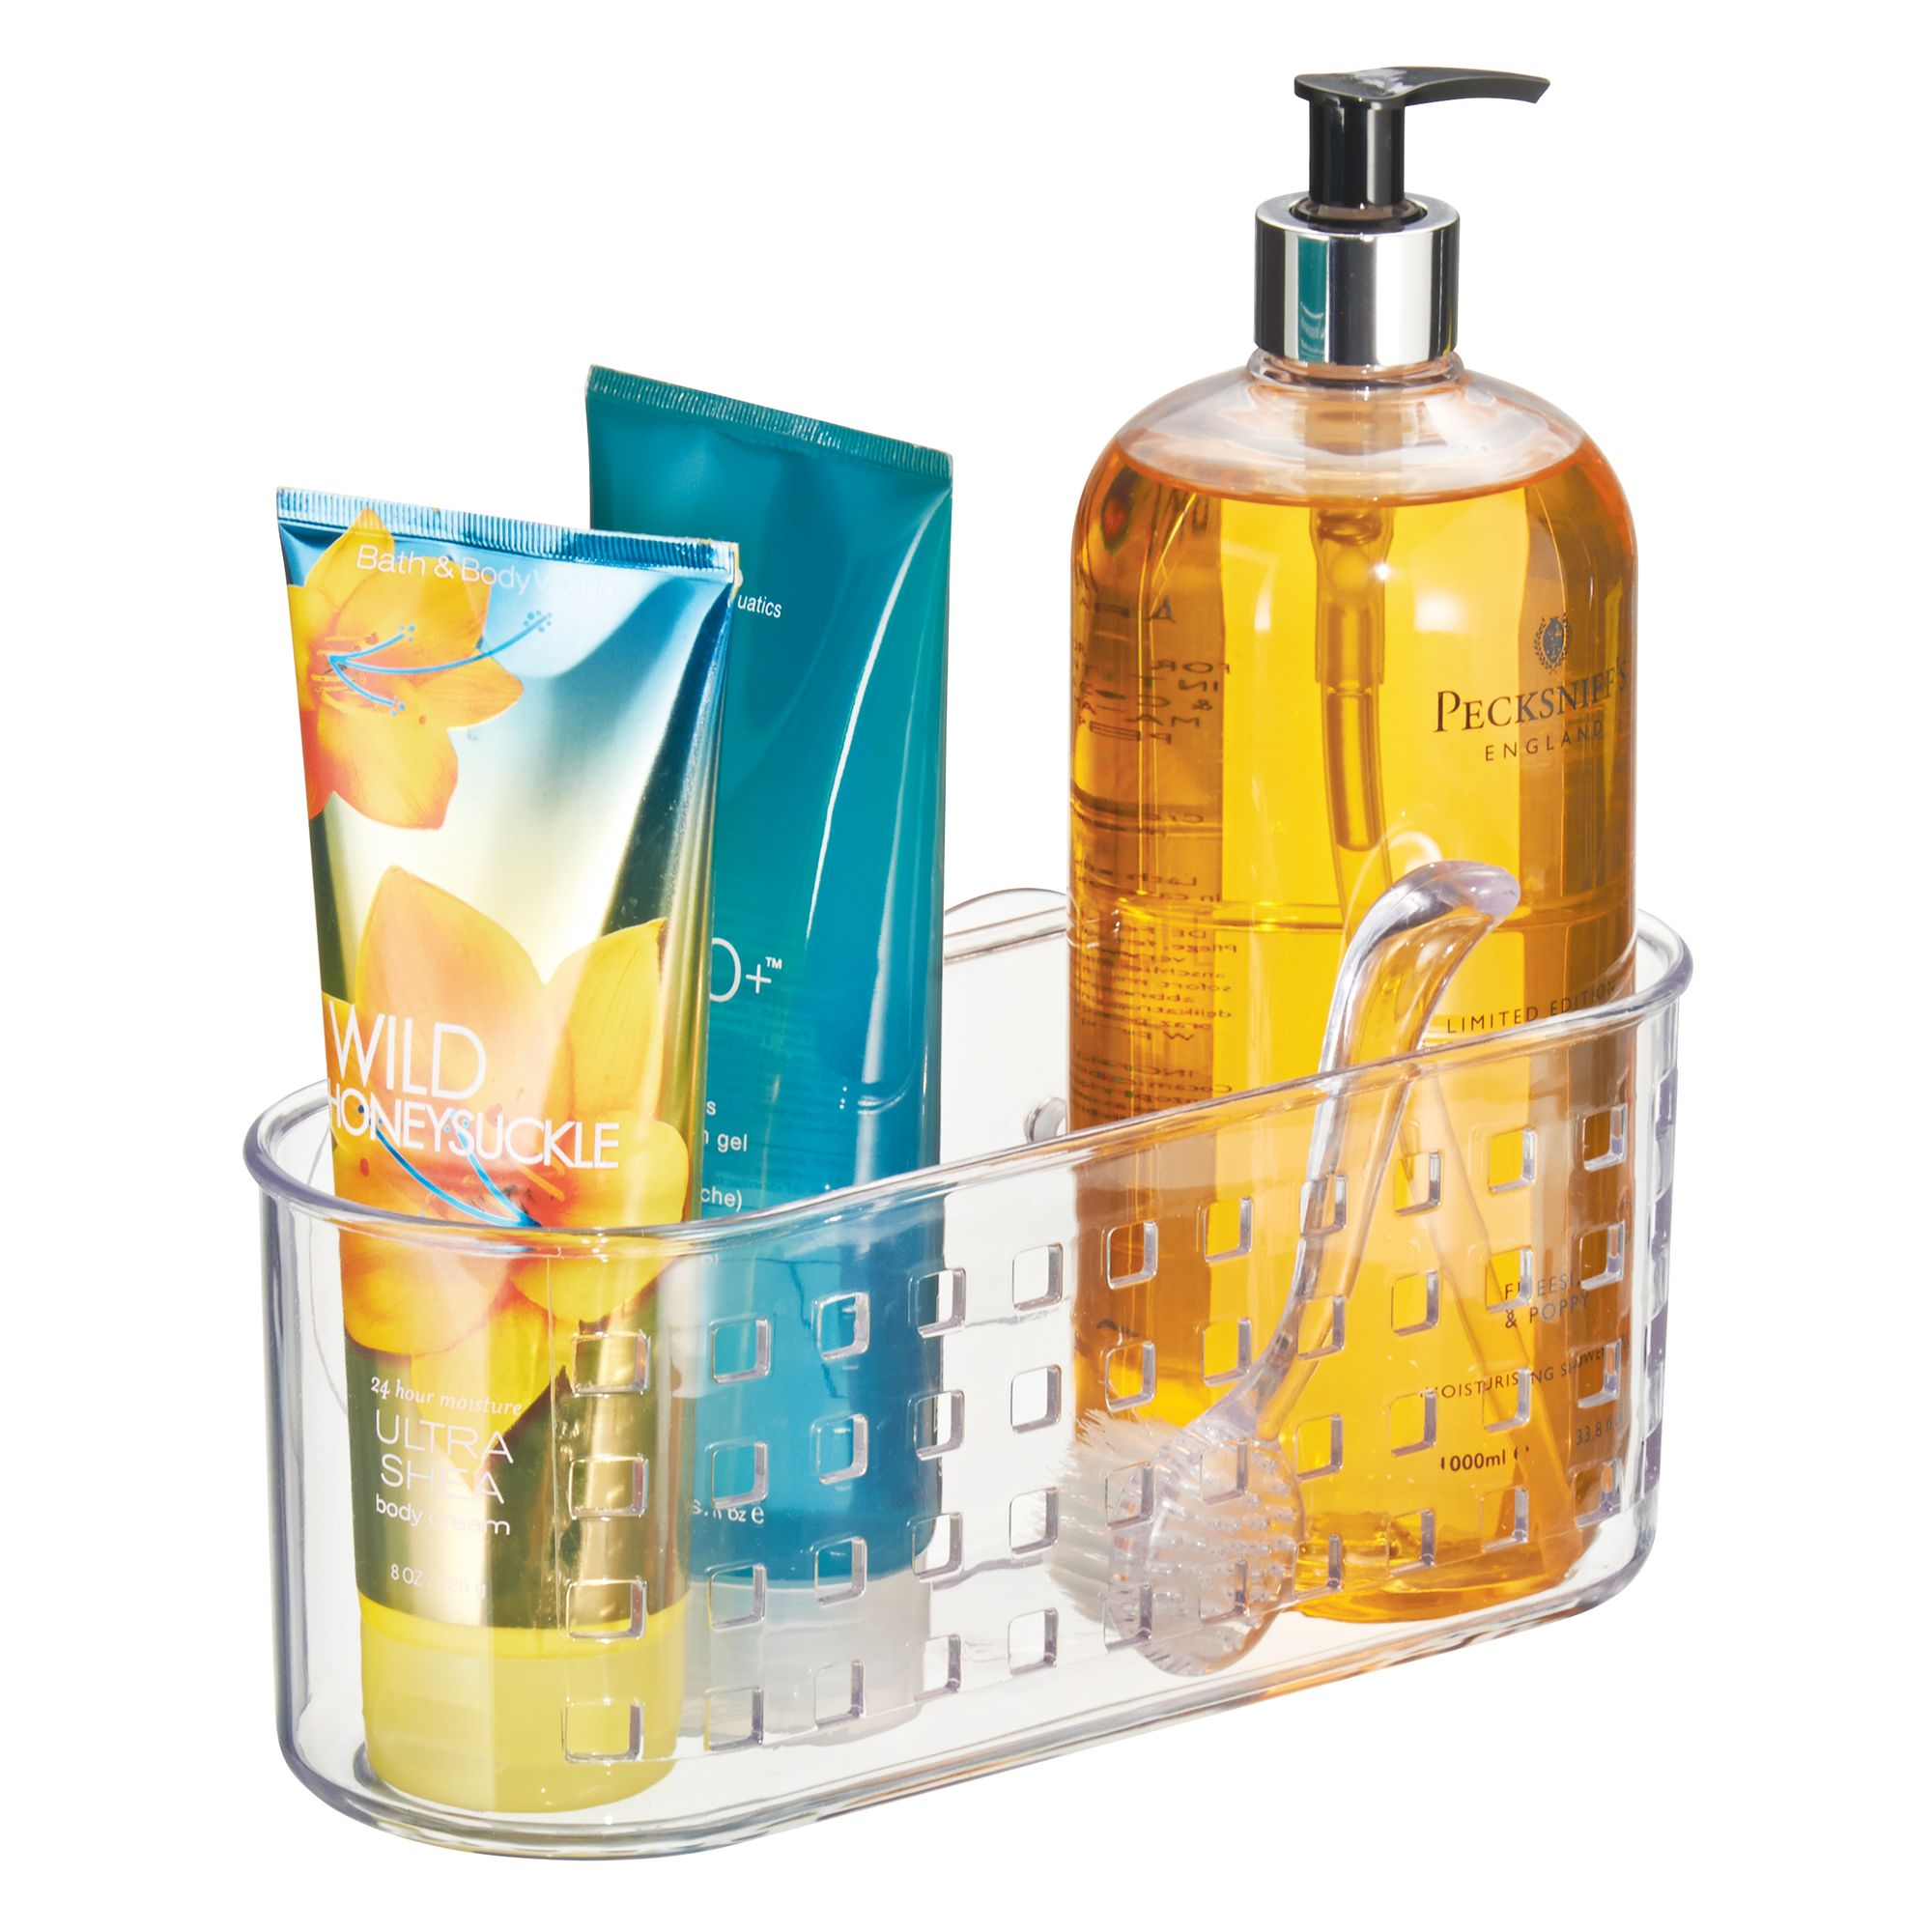 InterDesign Suction Bathroom Shower Caddy Basket - Walmart.com